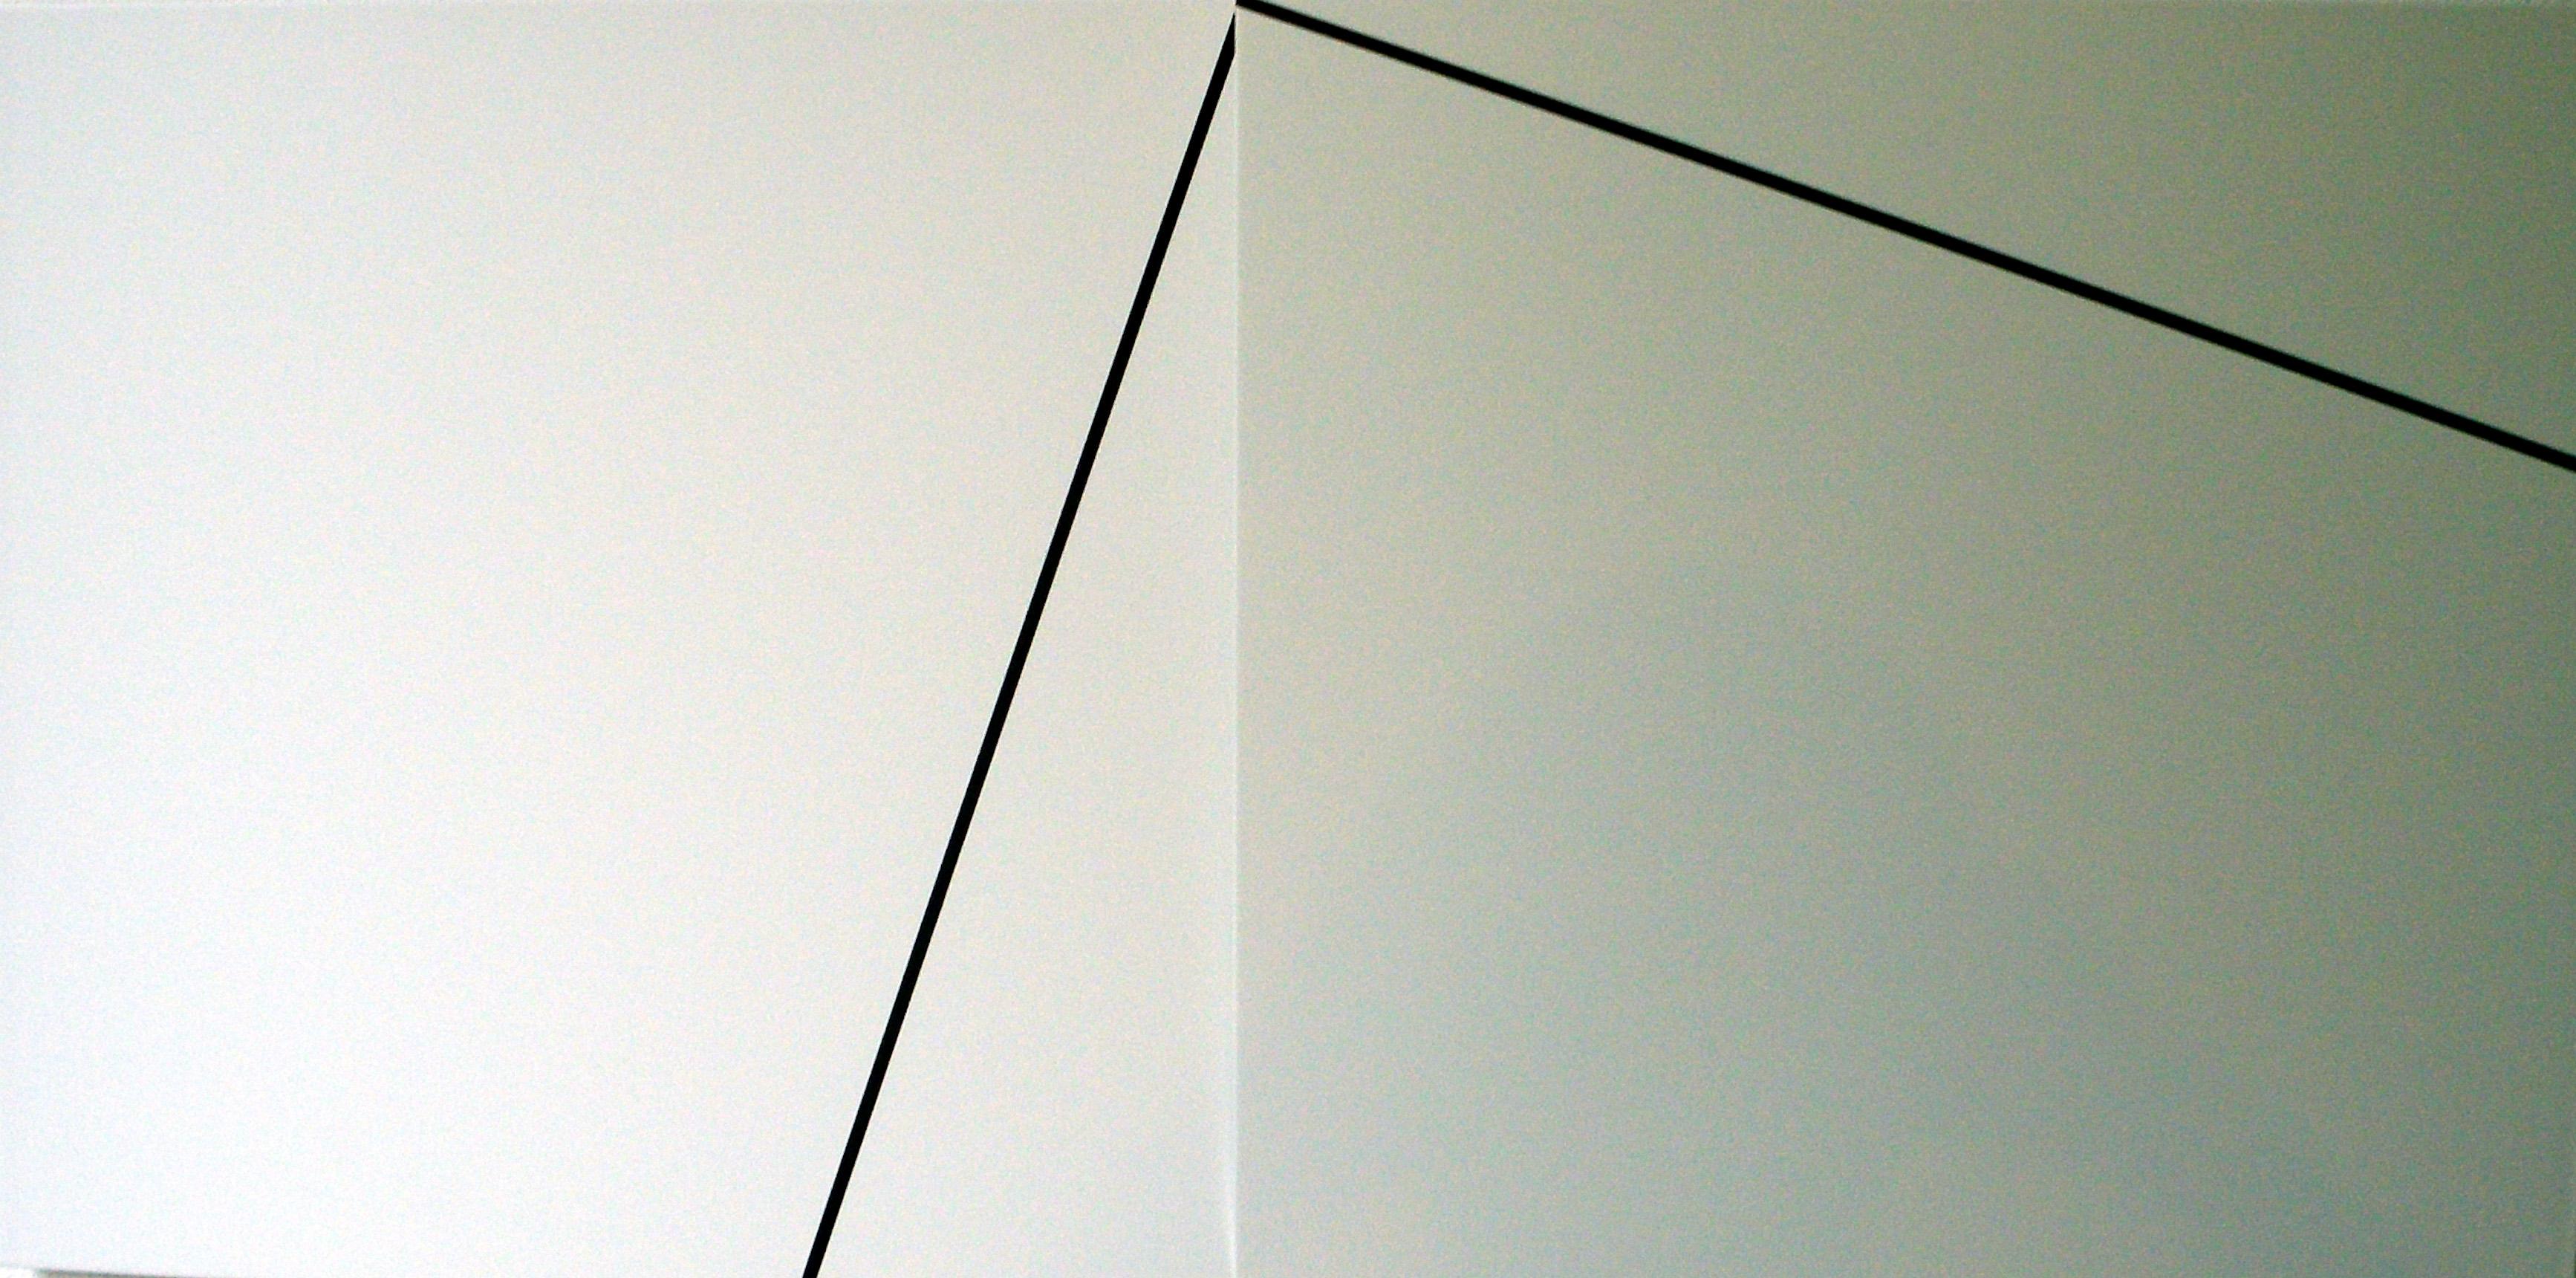 Gerhard Frömel - Lineare Winkelbildung